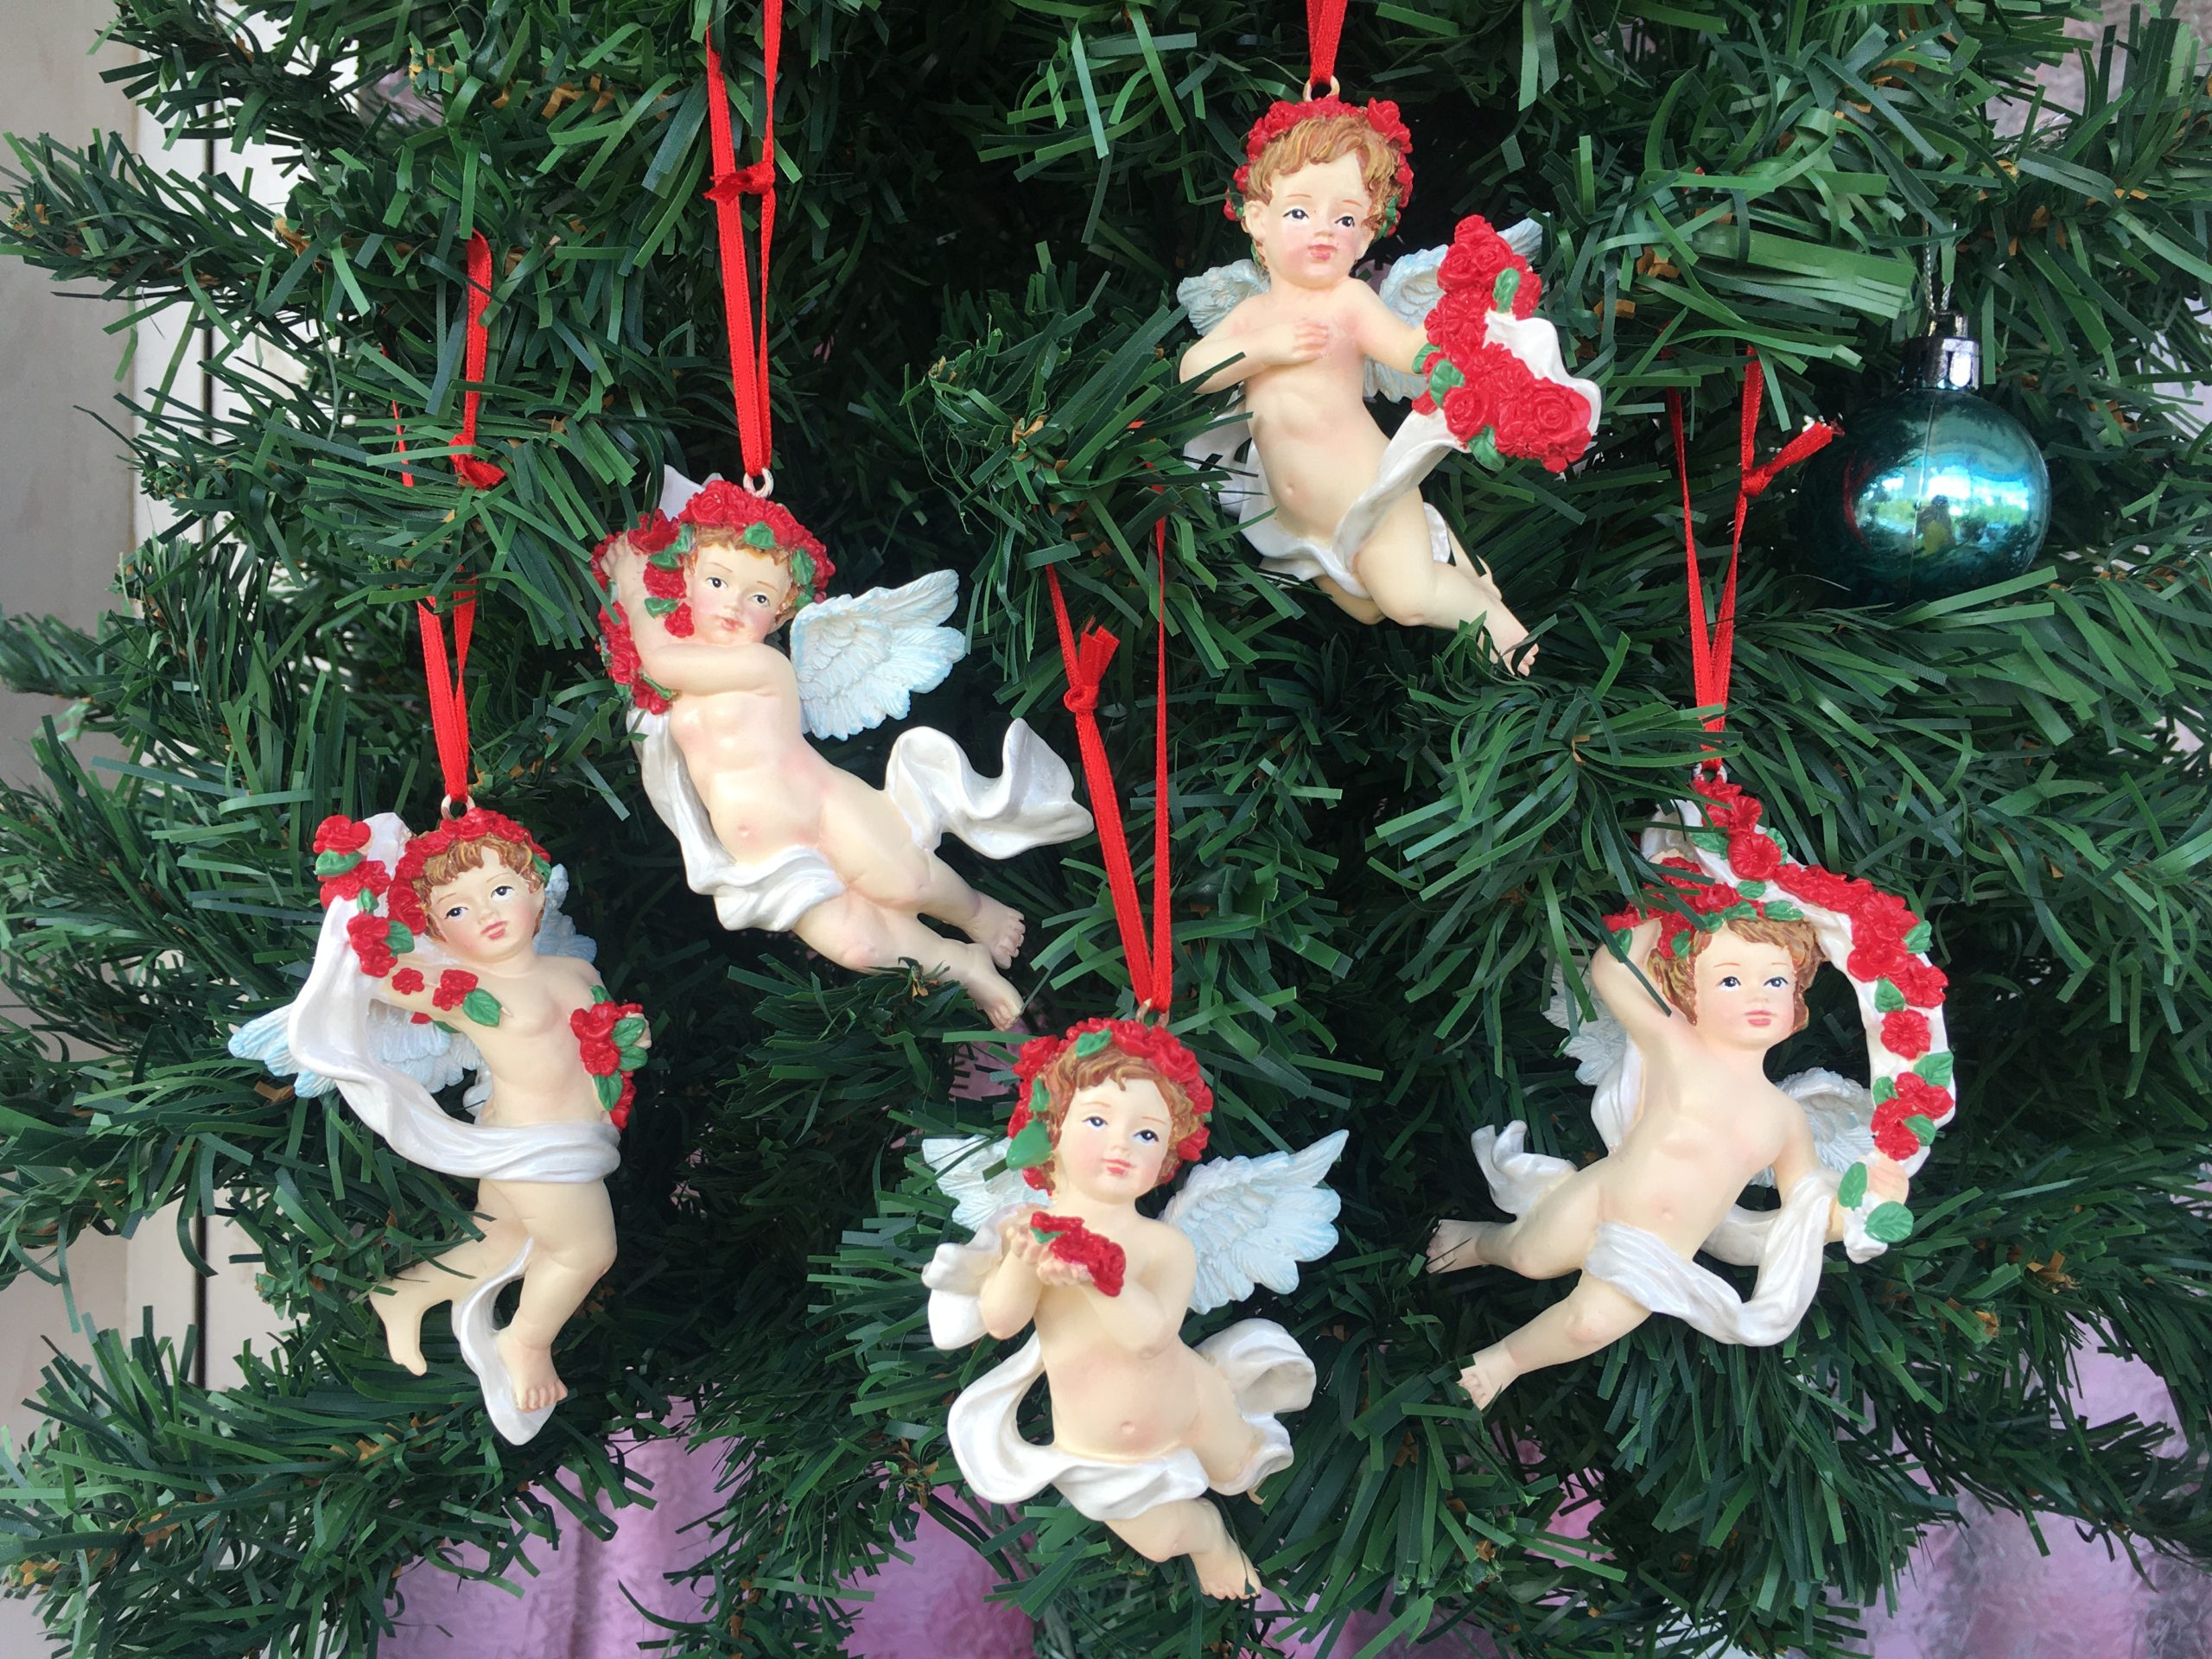 Christmas Tree Ornaments with Cherubs